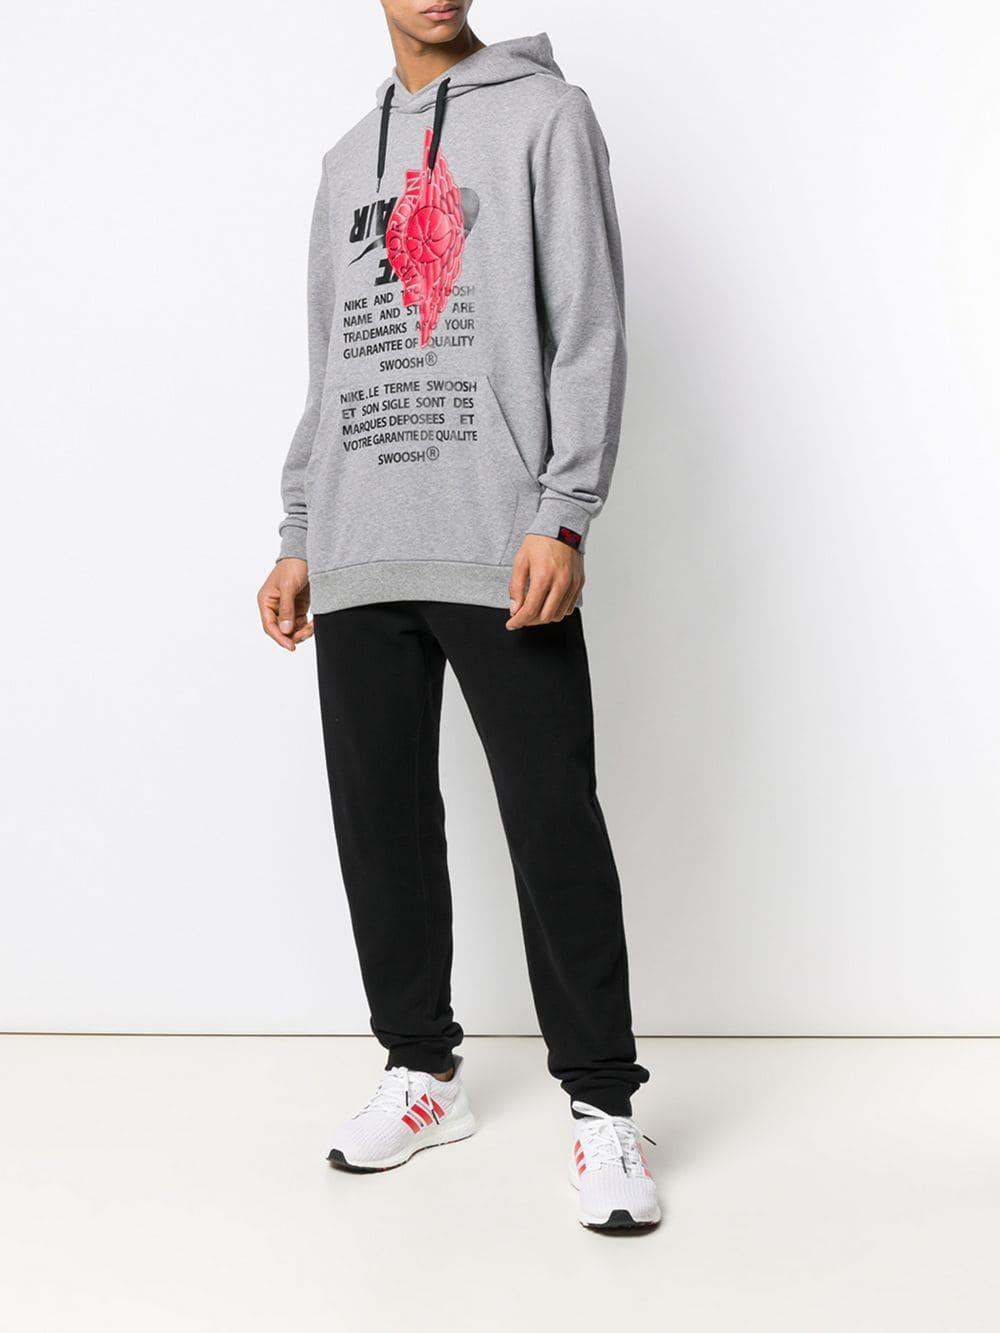 57d4829ea5d1 Lyst - Nike Jordan Jumpman Hoodie in Gray for Men